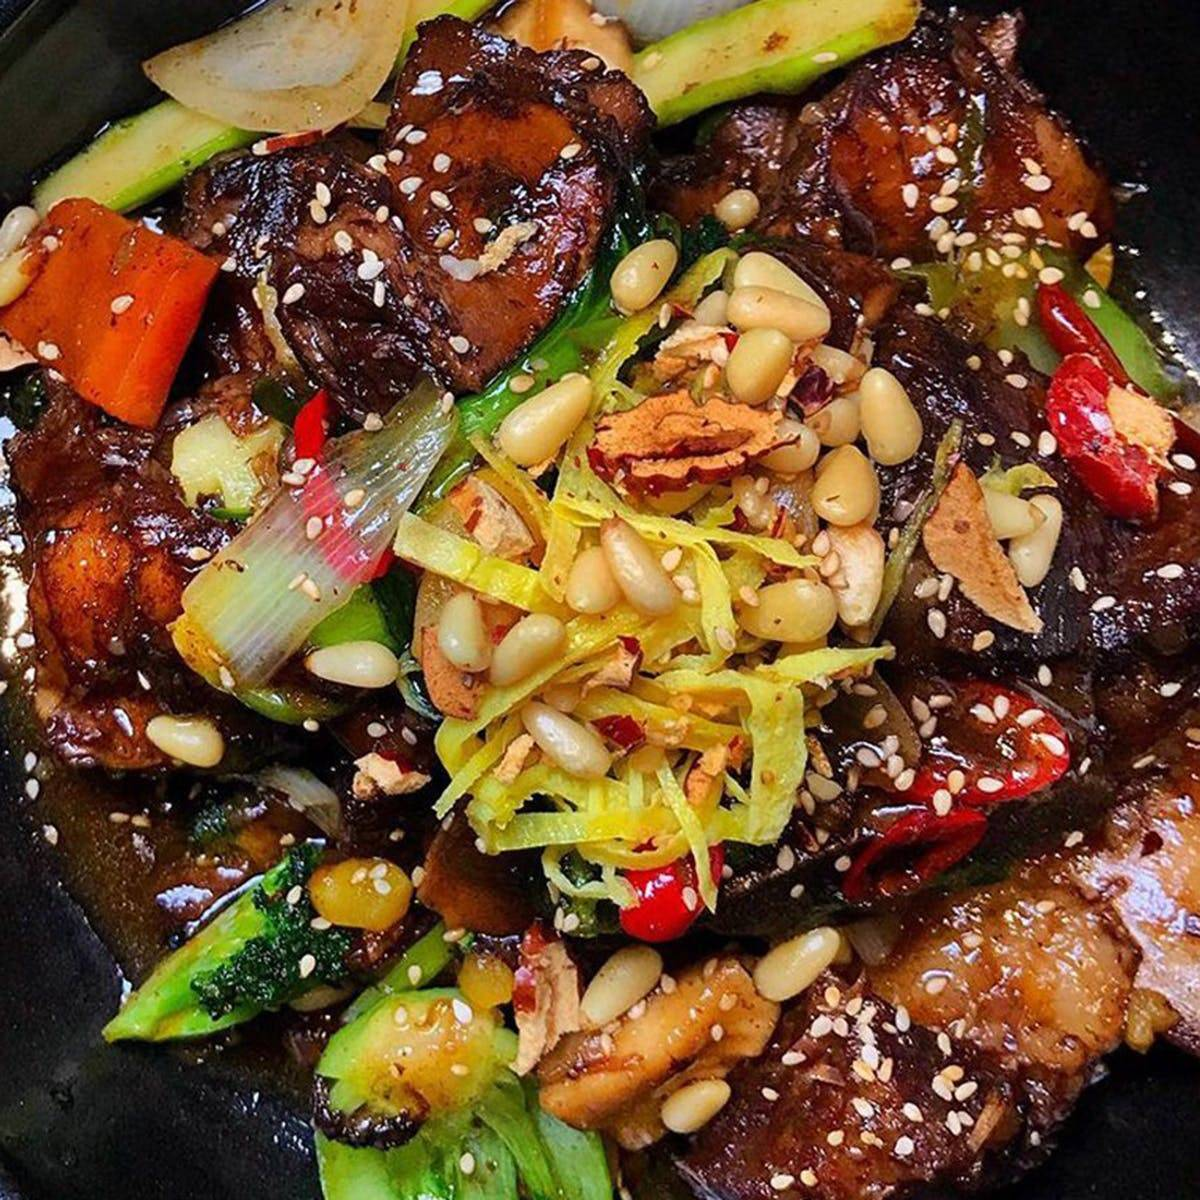 Samwon Garden Korean BBQ - Korean BBQ Galbi Jjim Kit for 4